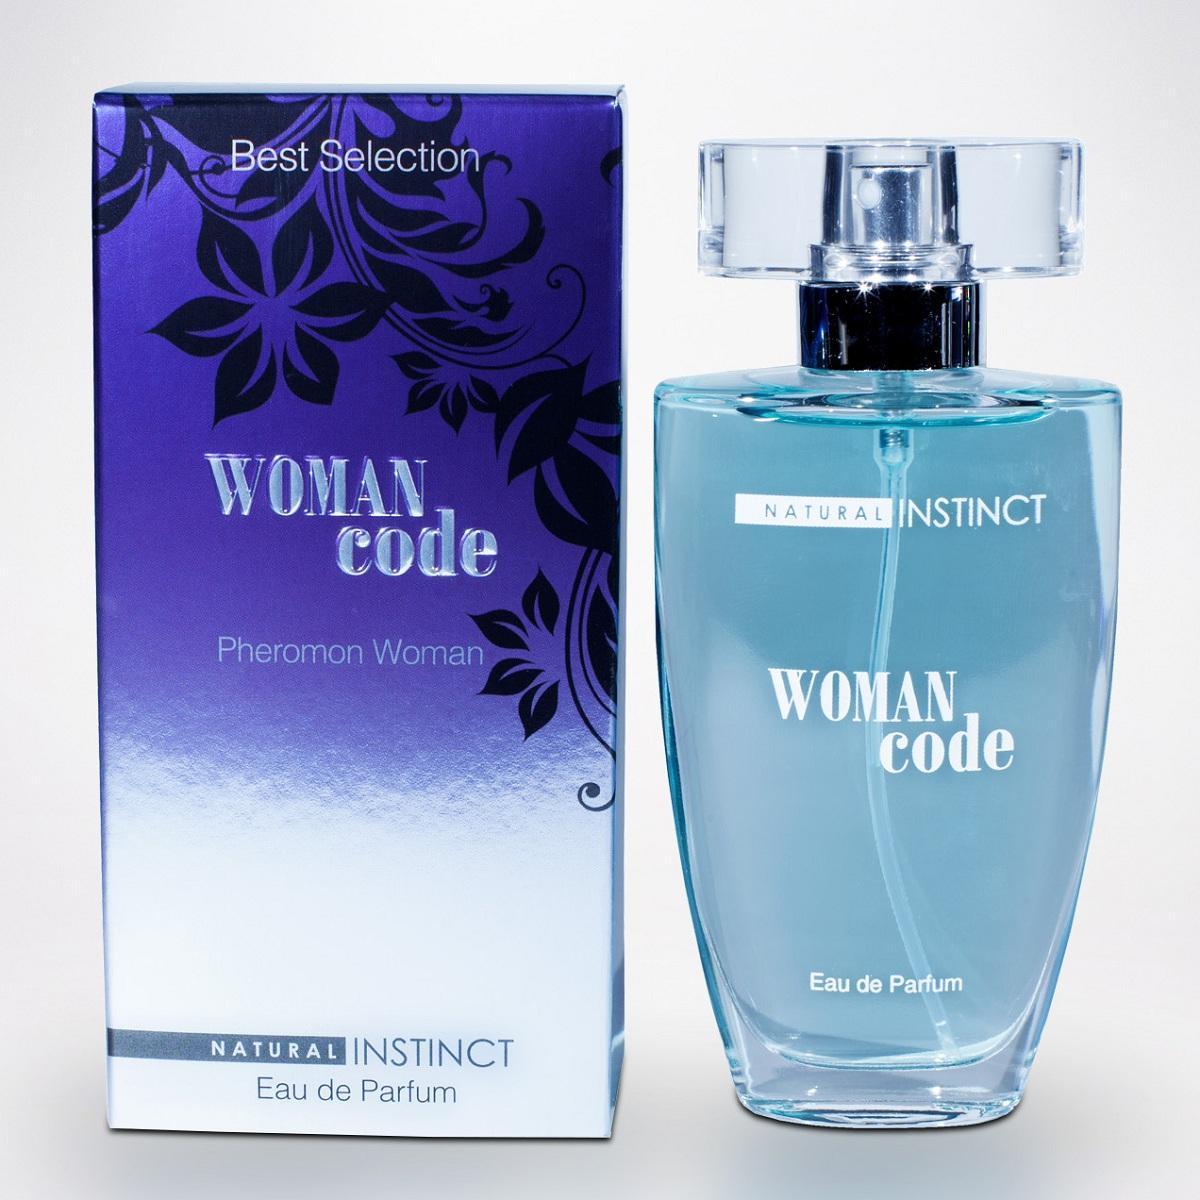 Женские духи с феромонами Natural Instinct Woman Code - 50 мл.-6319